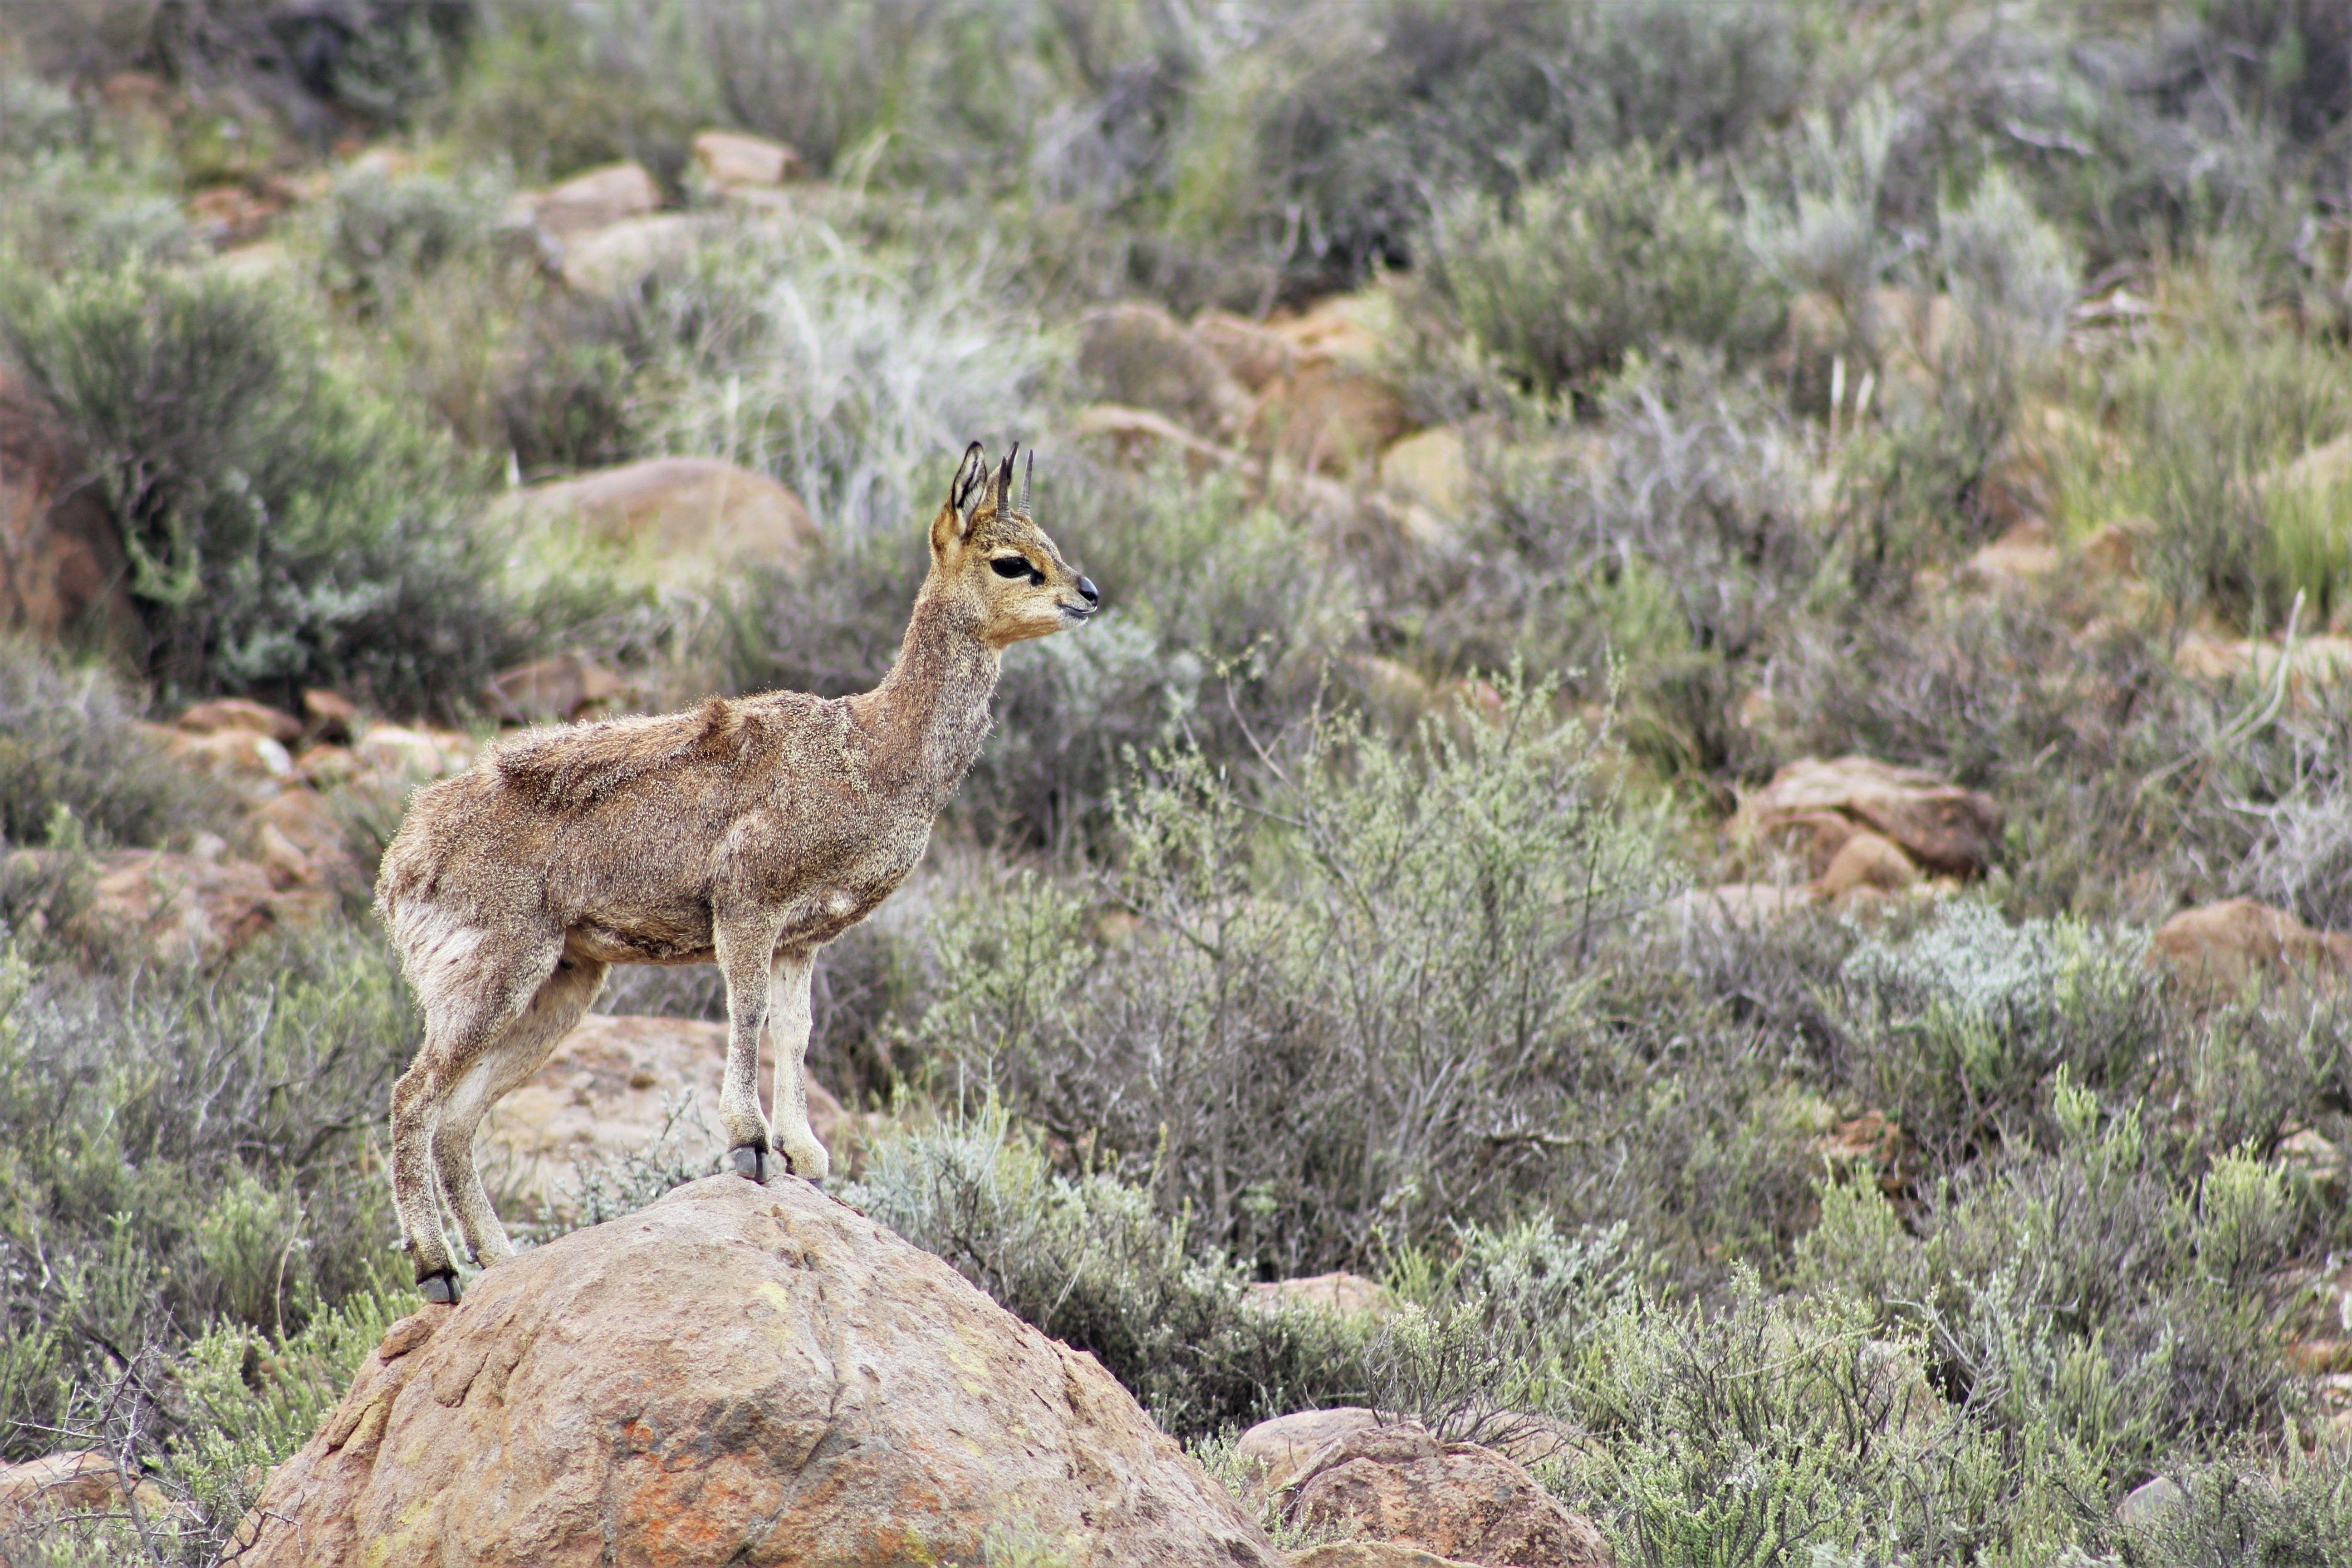 Cute little klipspringer standing proudly atop the rock.   #antelope #rockjumper #karoo #nationalpark #semidesert #beaufortwest #wildlife #nature #southafrica